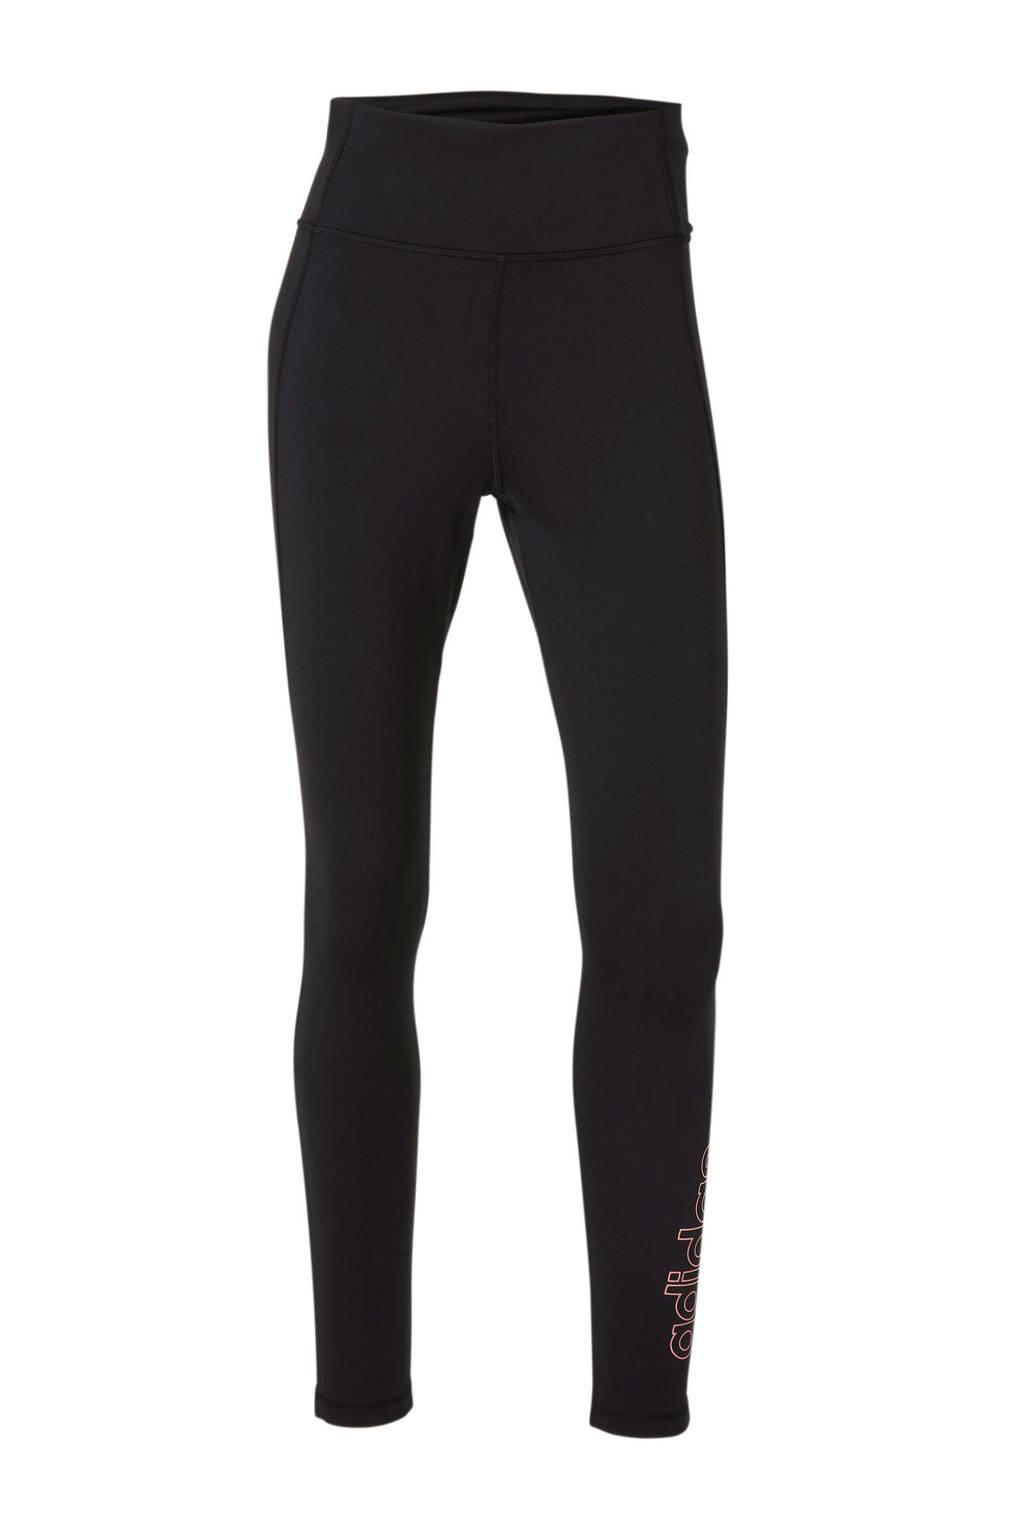 adidas Performance sportbroek zwart, Zwart/roze